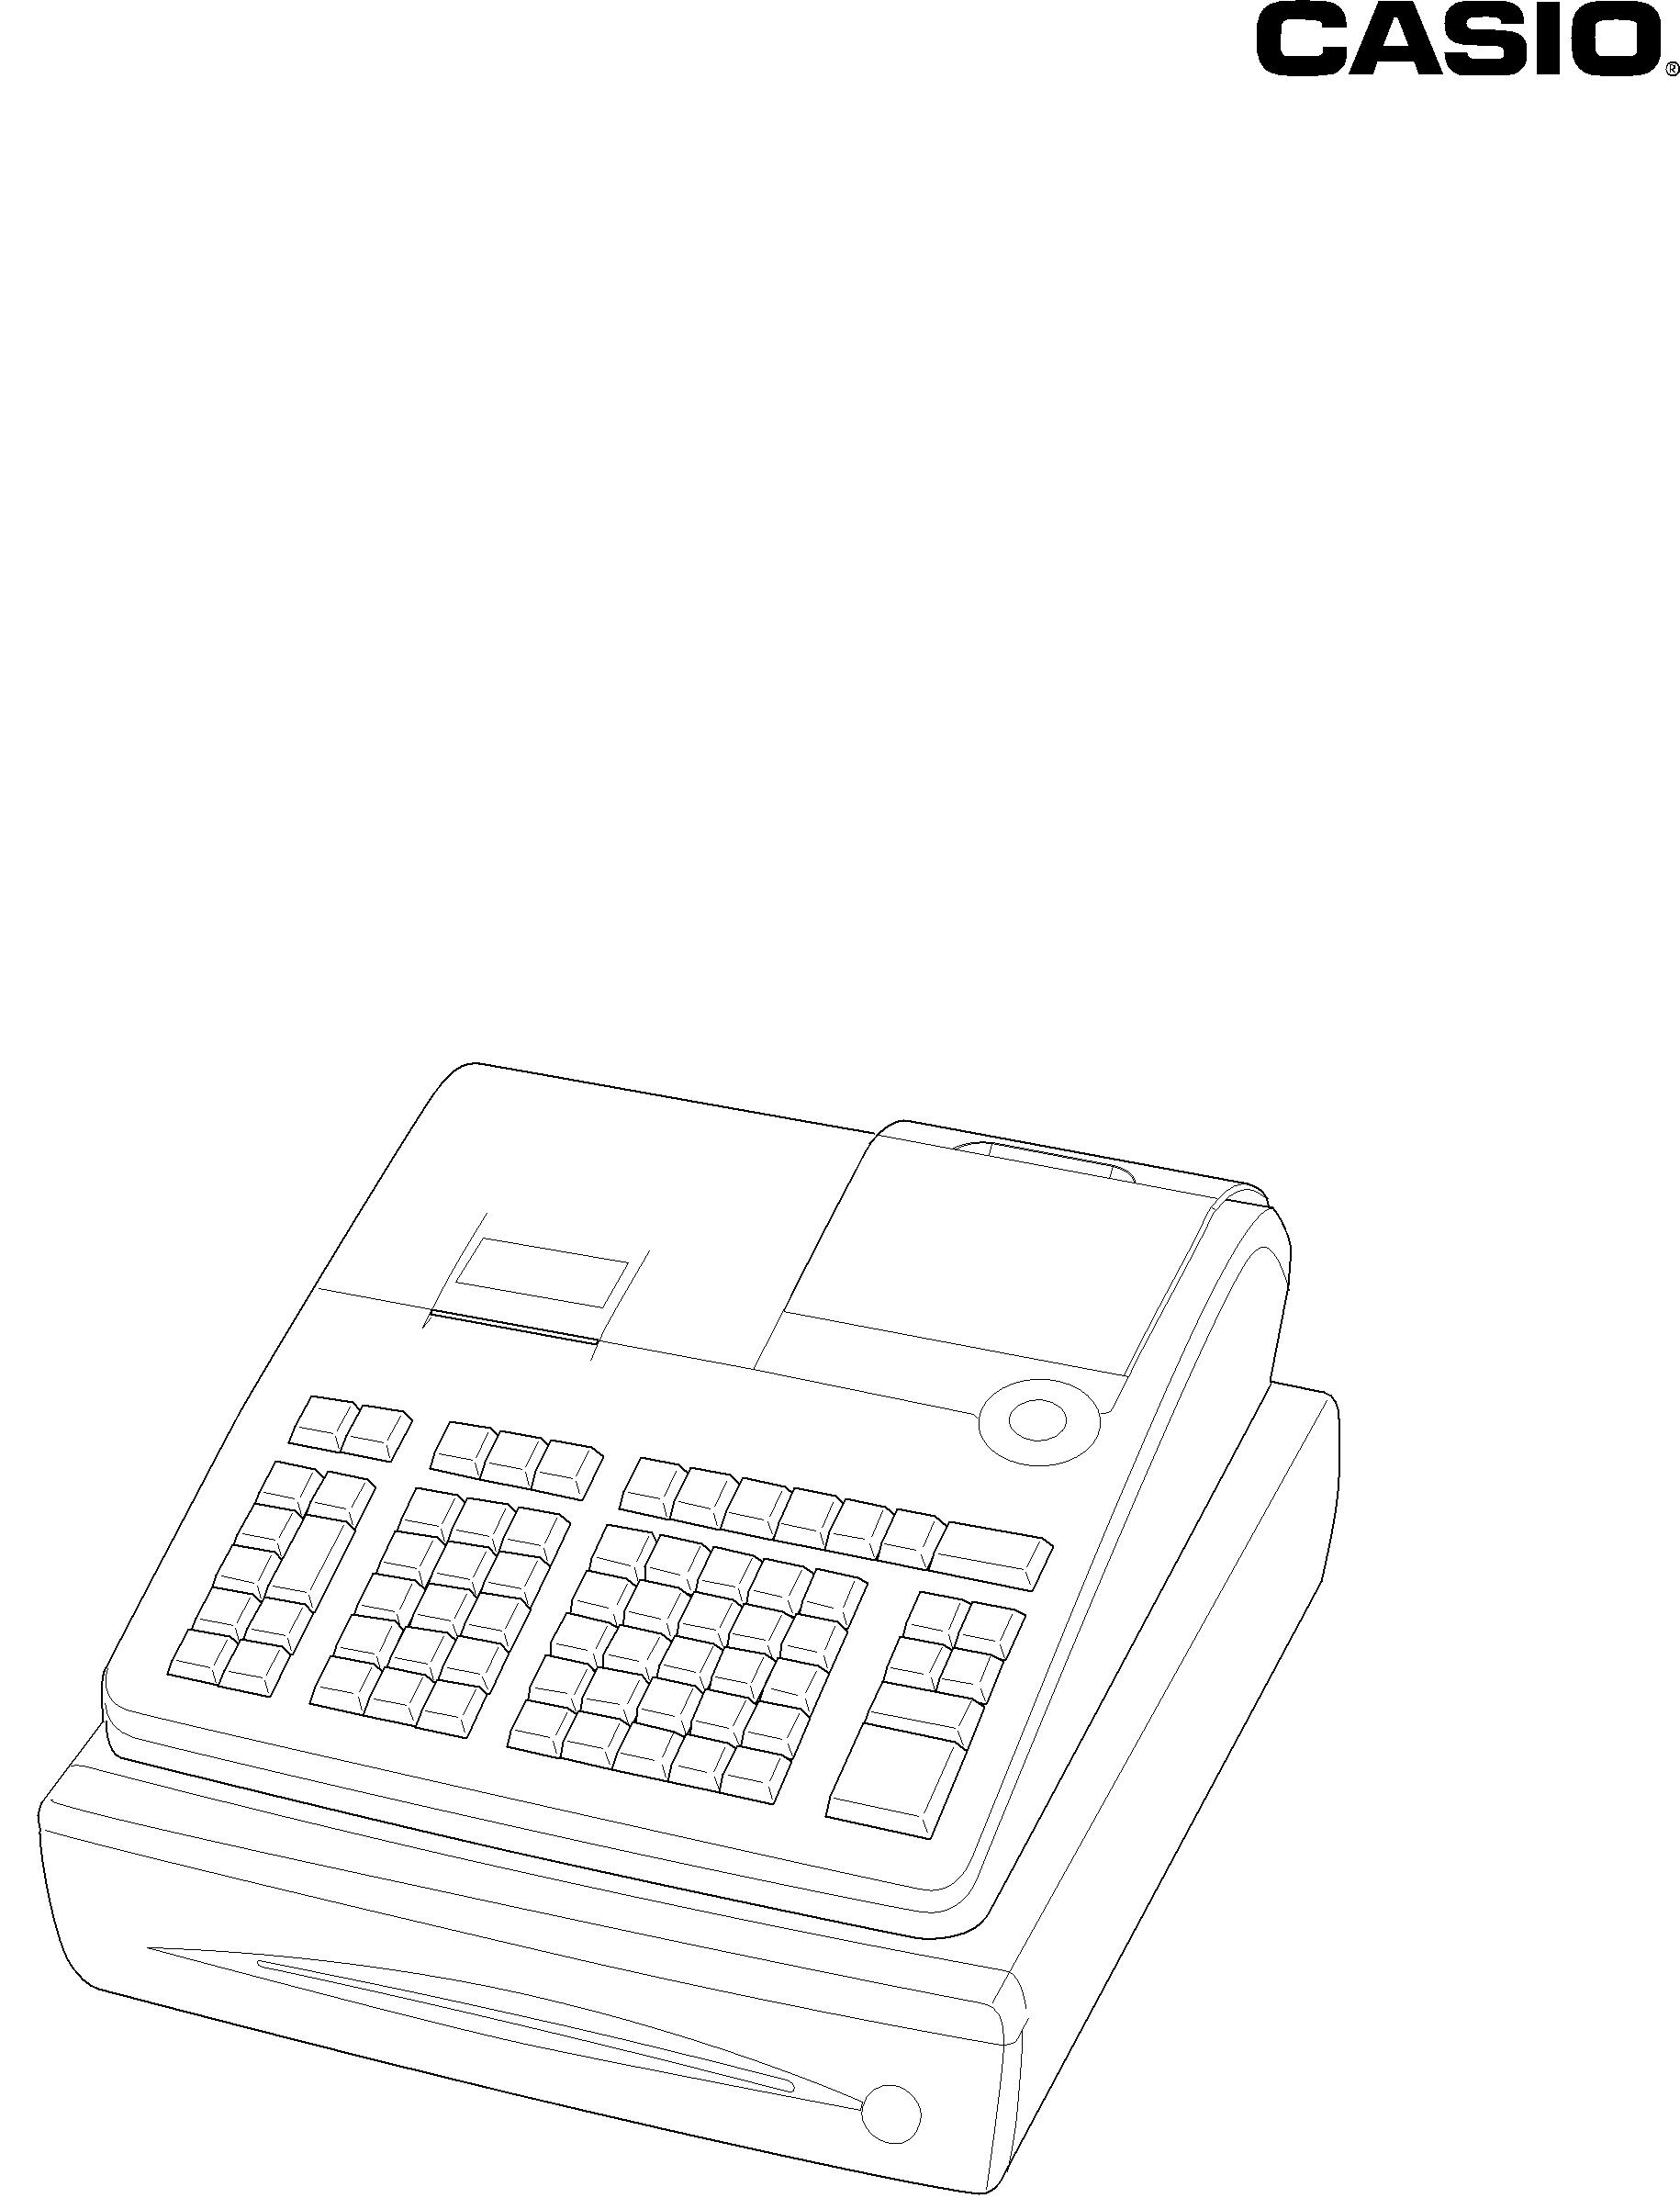 Casio SE-S400 manual